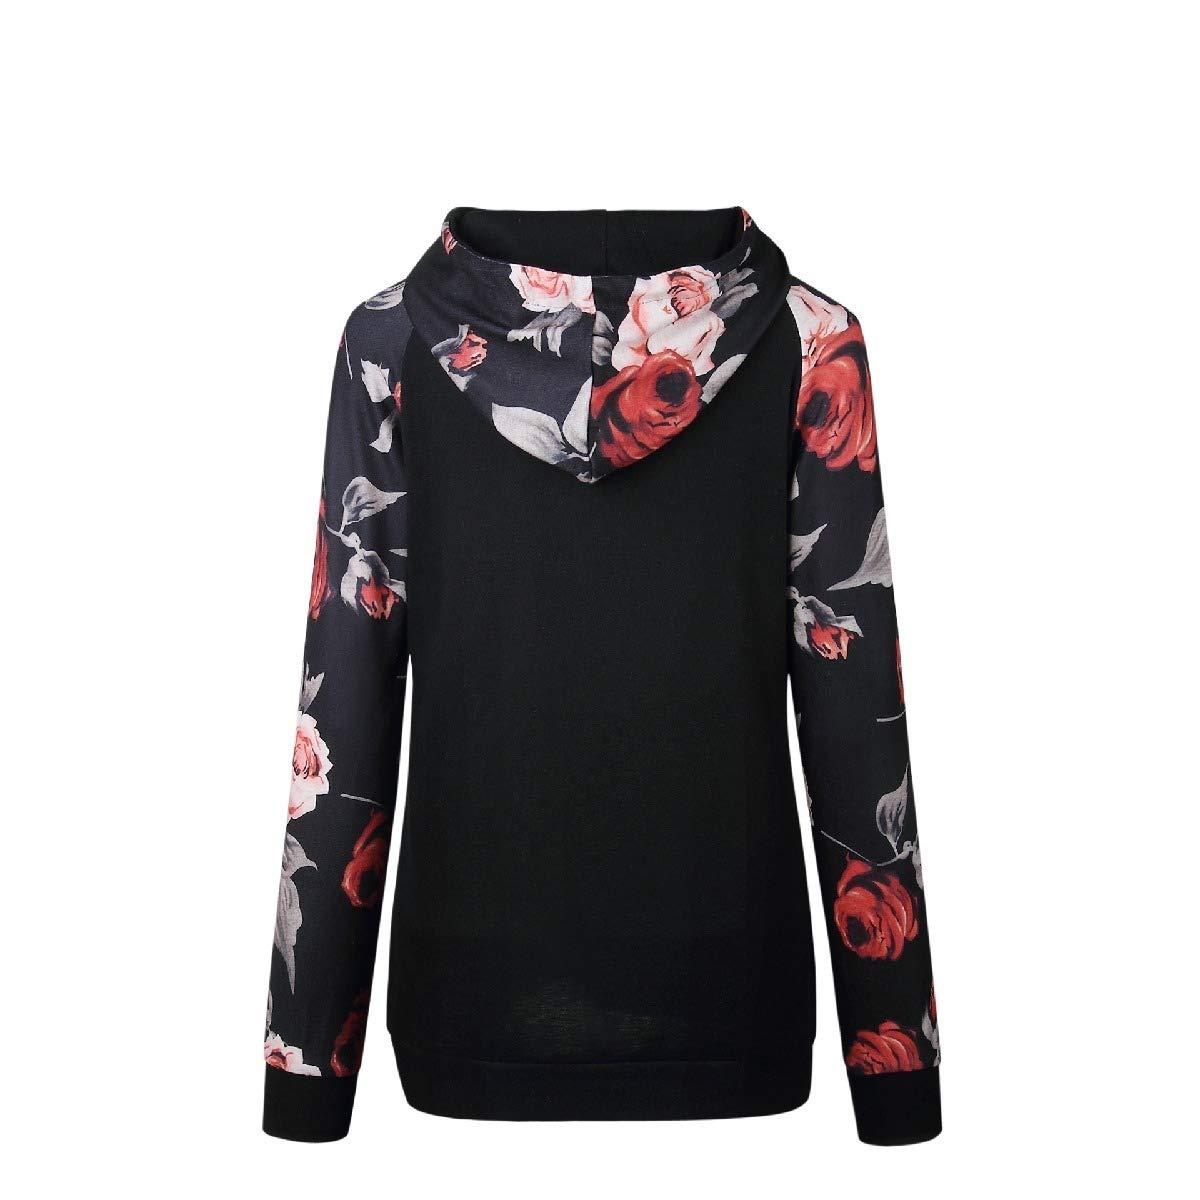 Losait Womens Lightweight Raglan with Kanga Pocket Pullover Hoodies Sweater